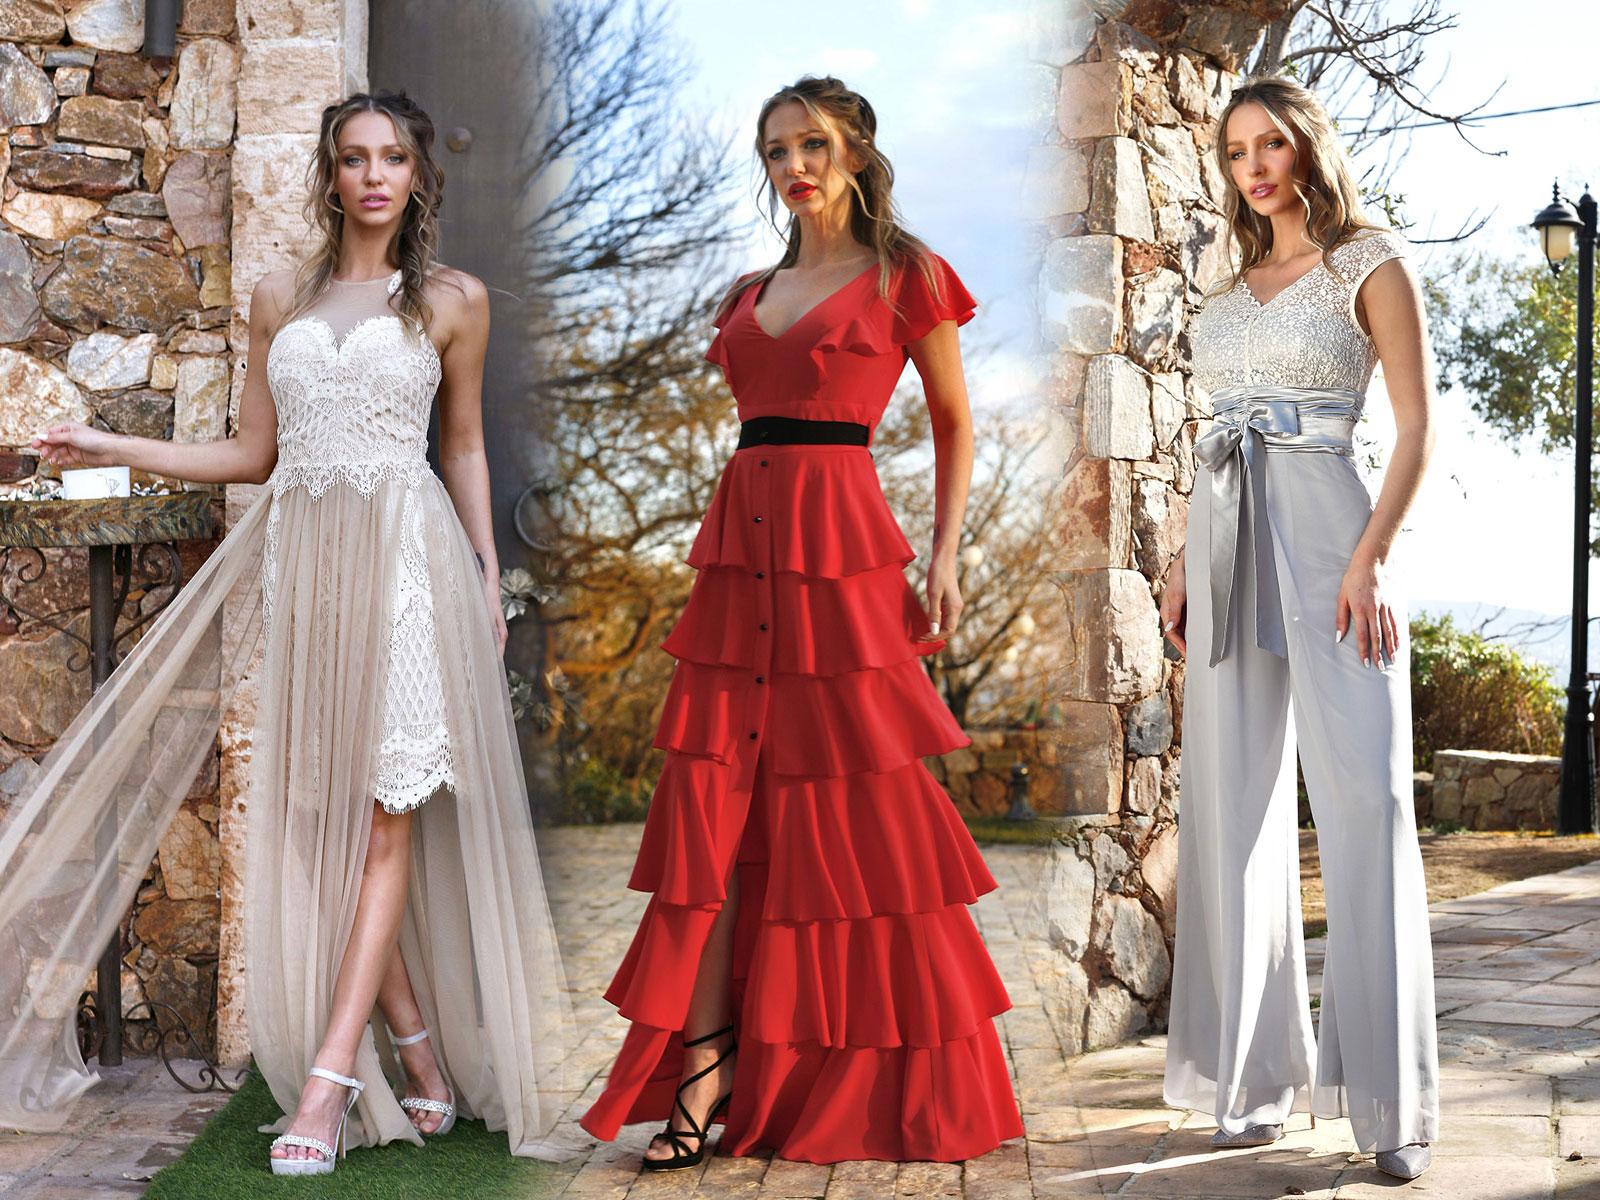 STRASS Πειραιάς φορέματα γάμος βάπτισης ρούχα βραδινά 8a86aa2af21